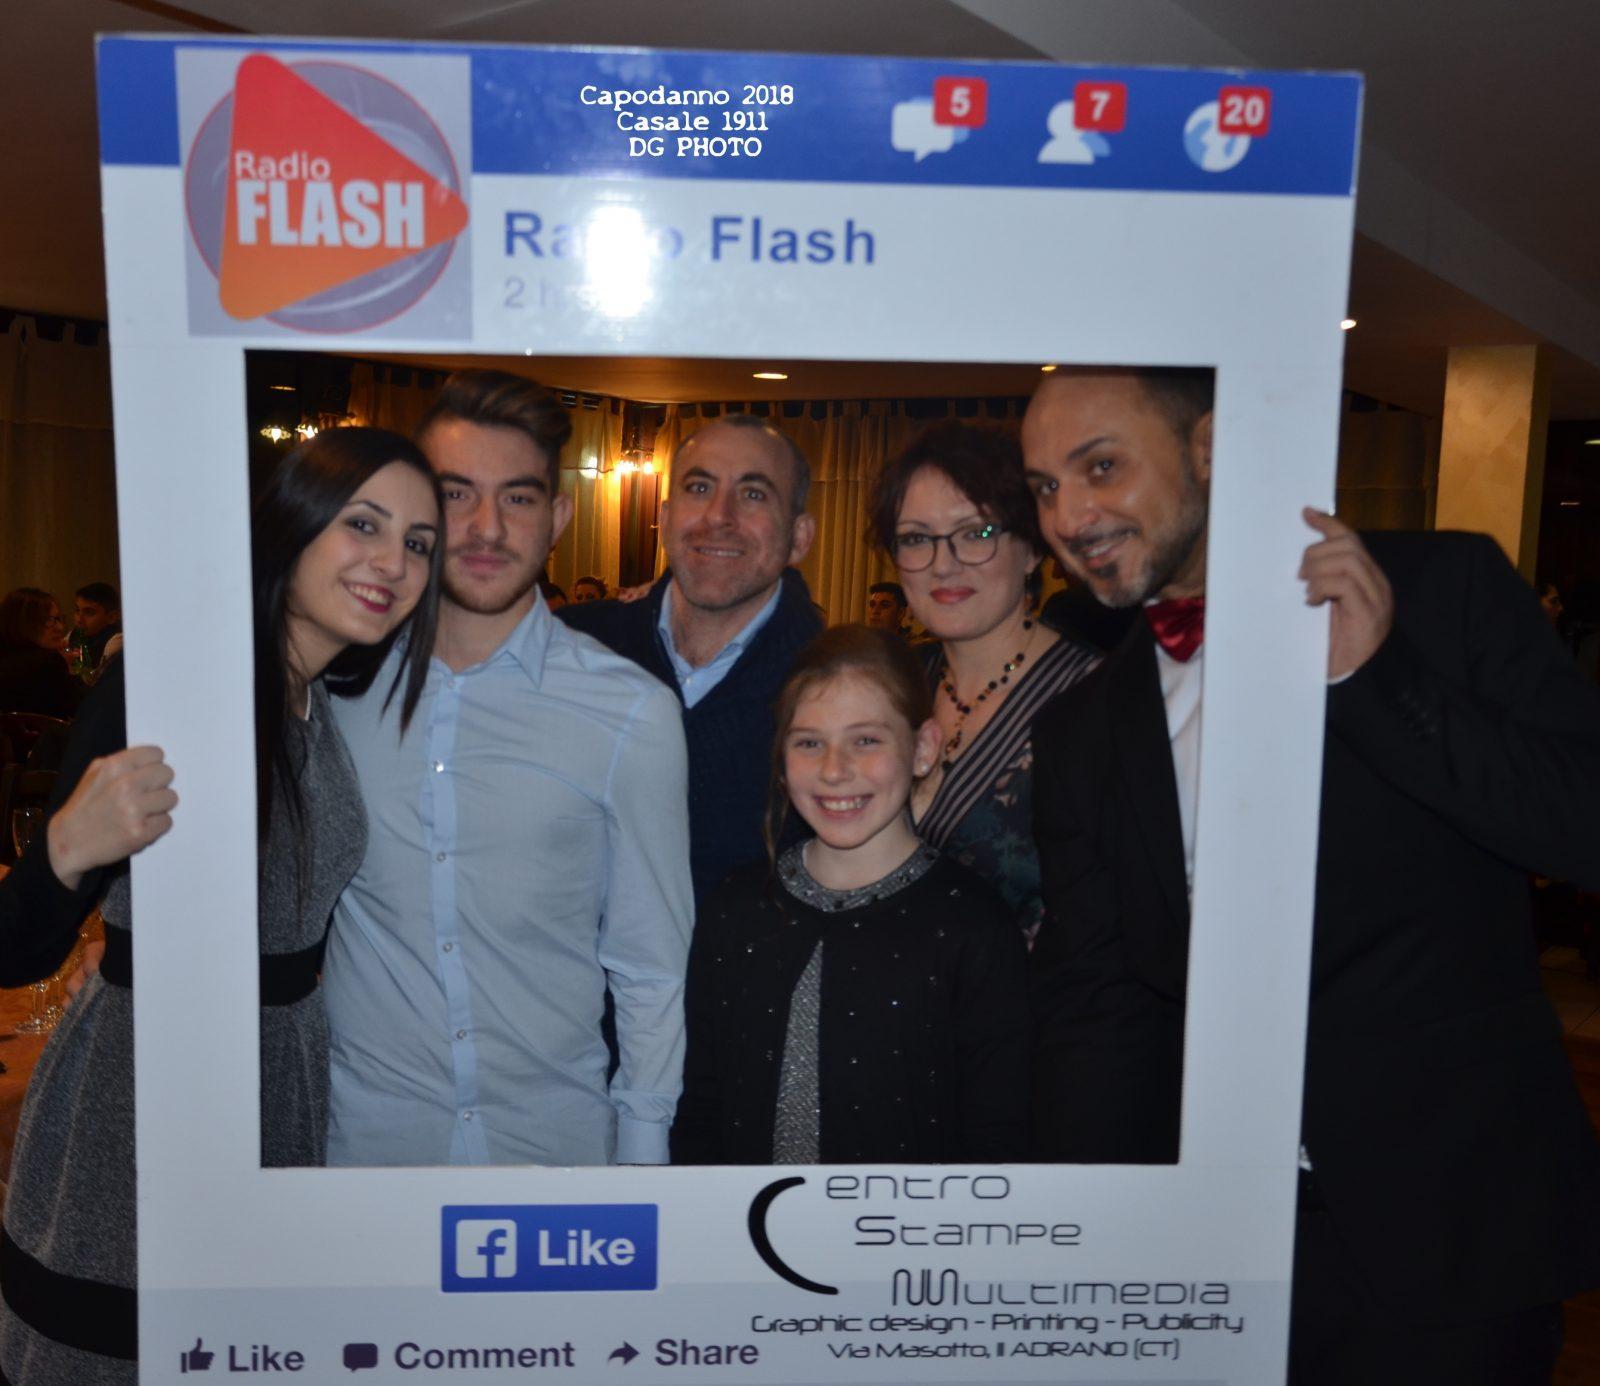 Radio Flash – Capodanno 2018 Casale 1911